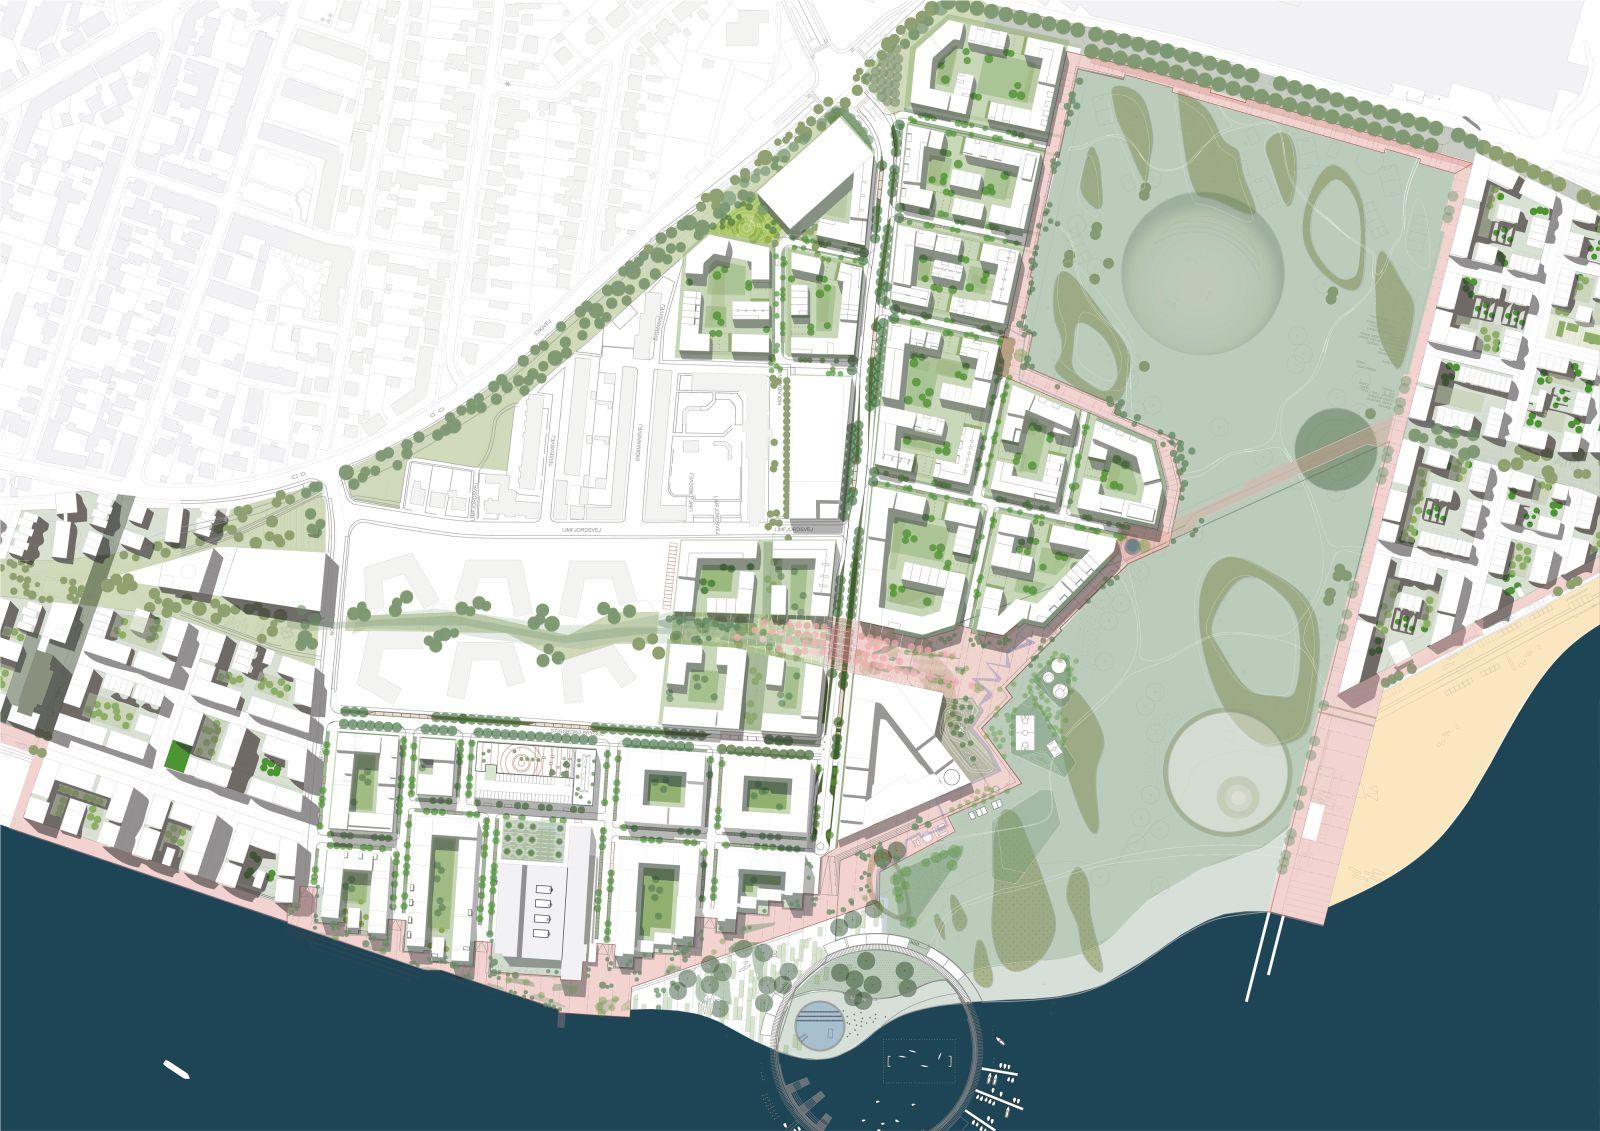 Stigsborg Waterfront